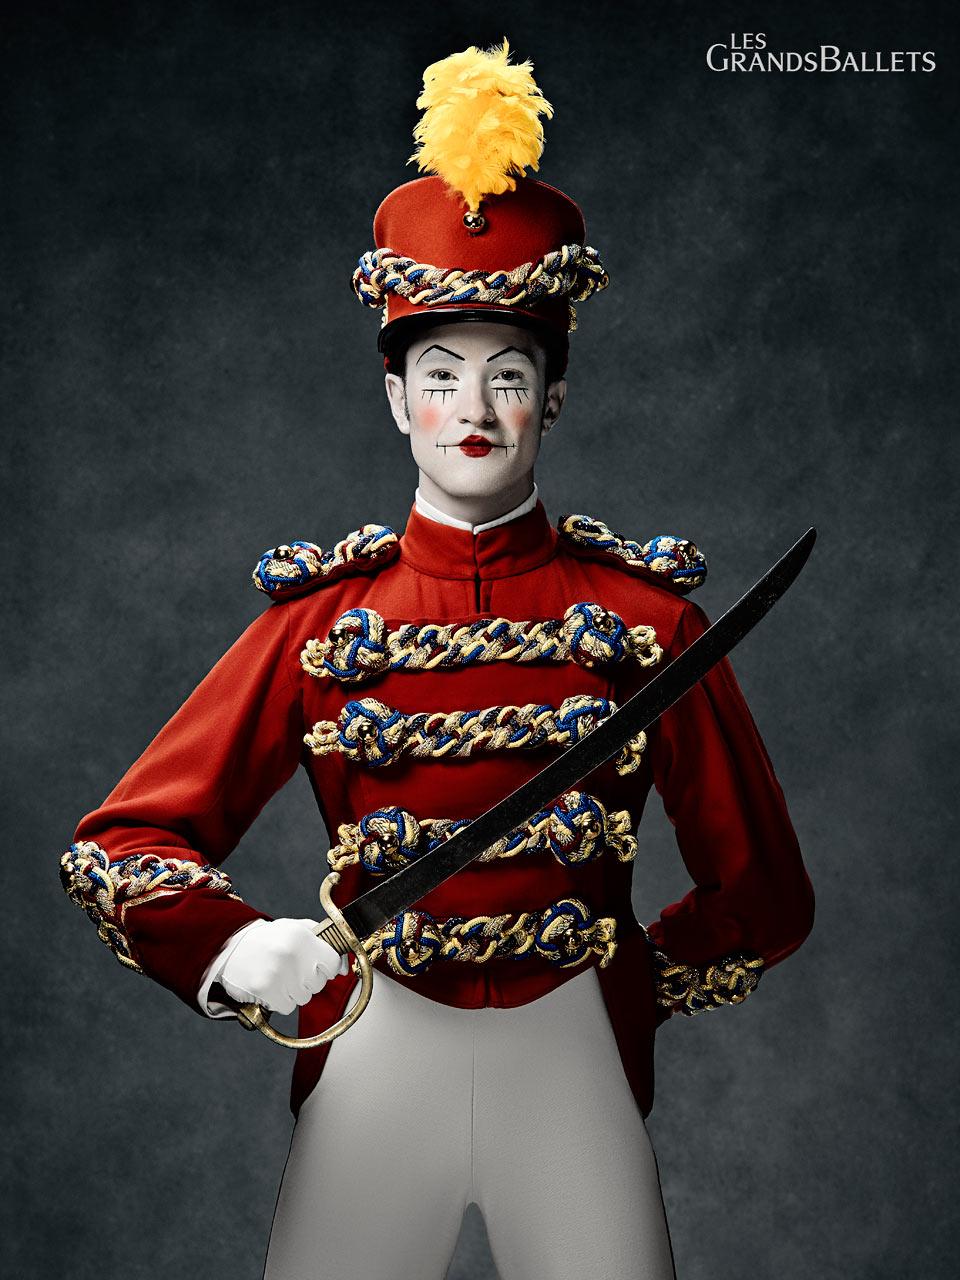 Dancer: Jean-Sebastien Couture in make-up by Make Up For Ever.